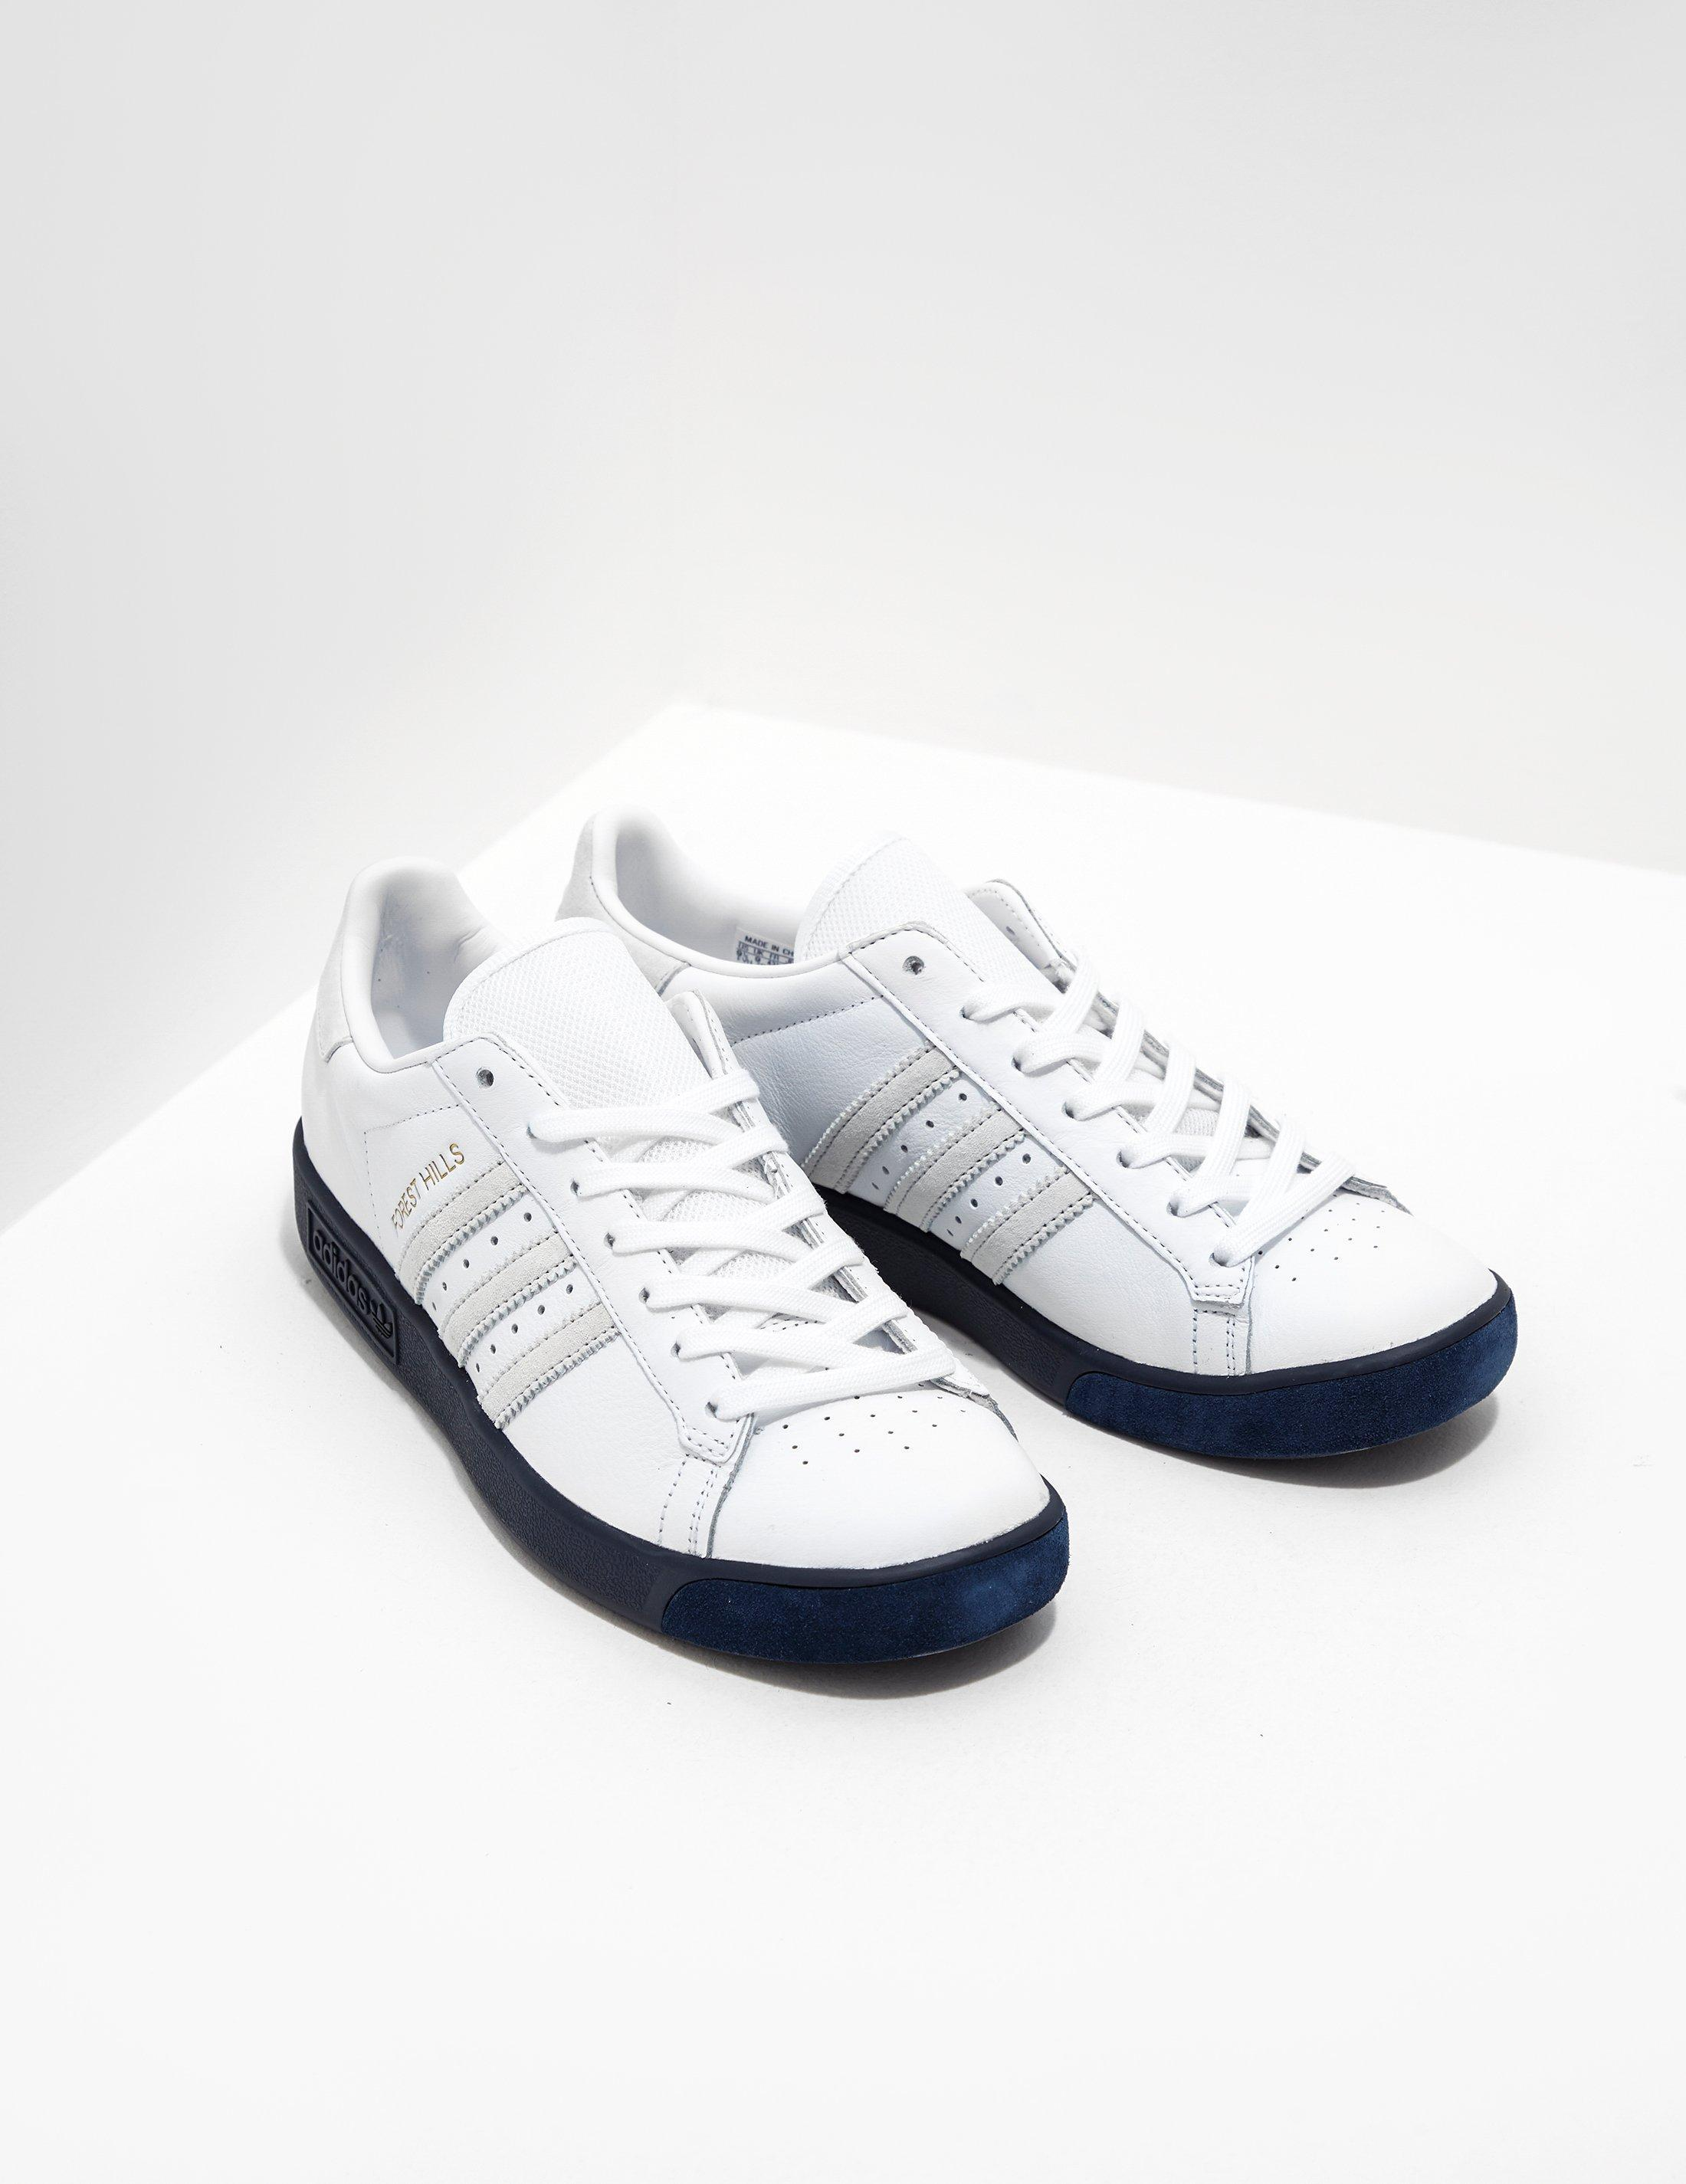 adidas Originals Leather Forest Hills Samstag White for Men